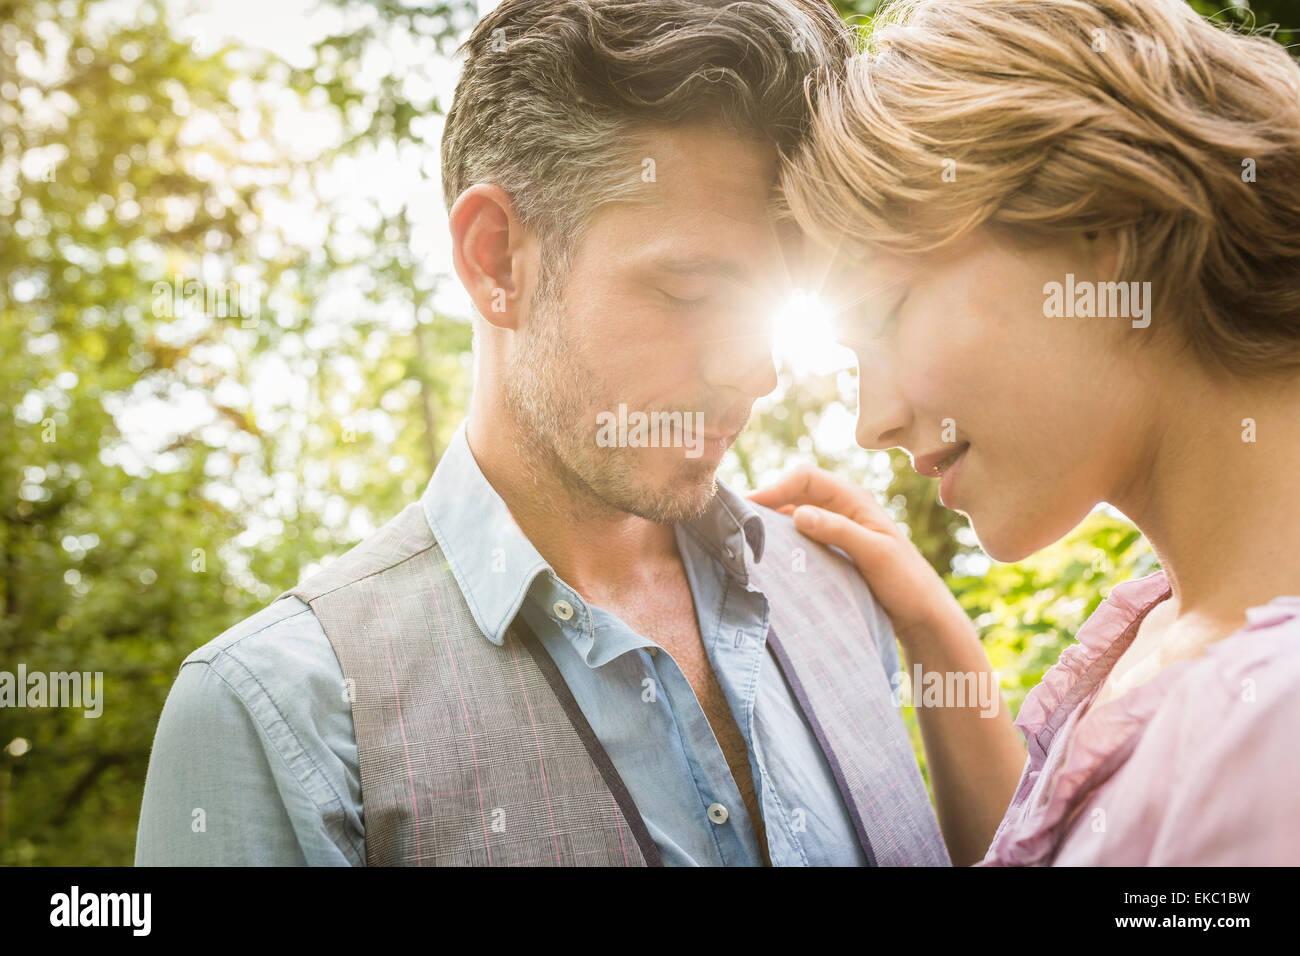 Couple hugging in garden - Stock Image